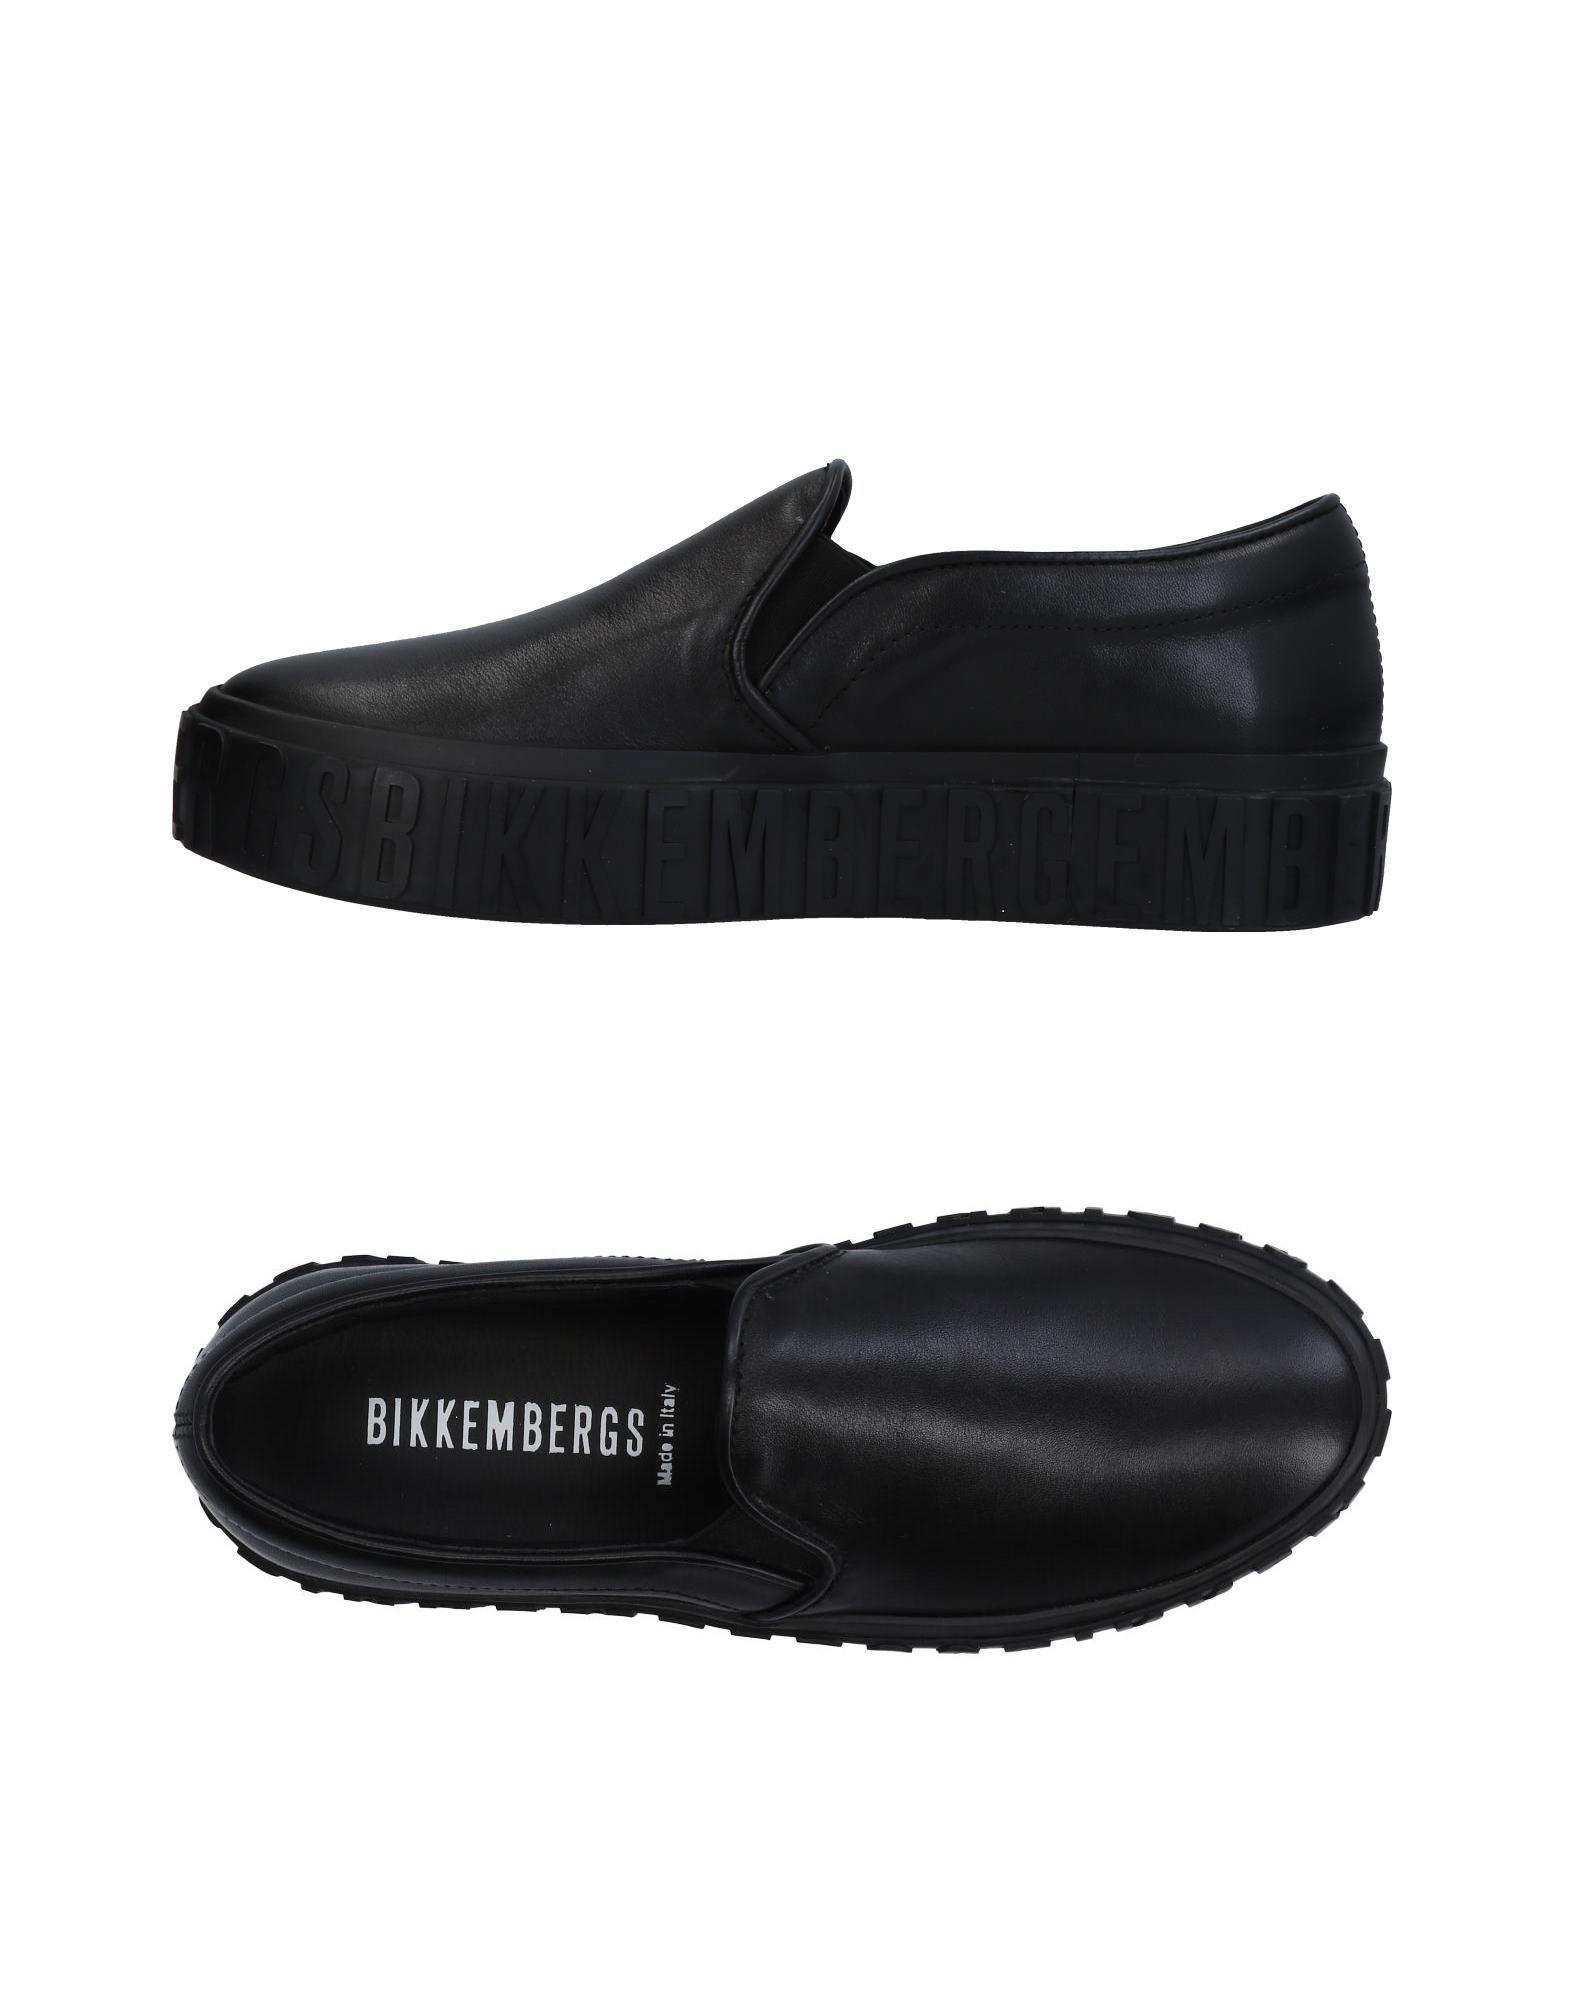 Moda Sneakers Bikkembergs Donna - 11451074DI